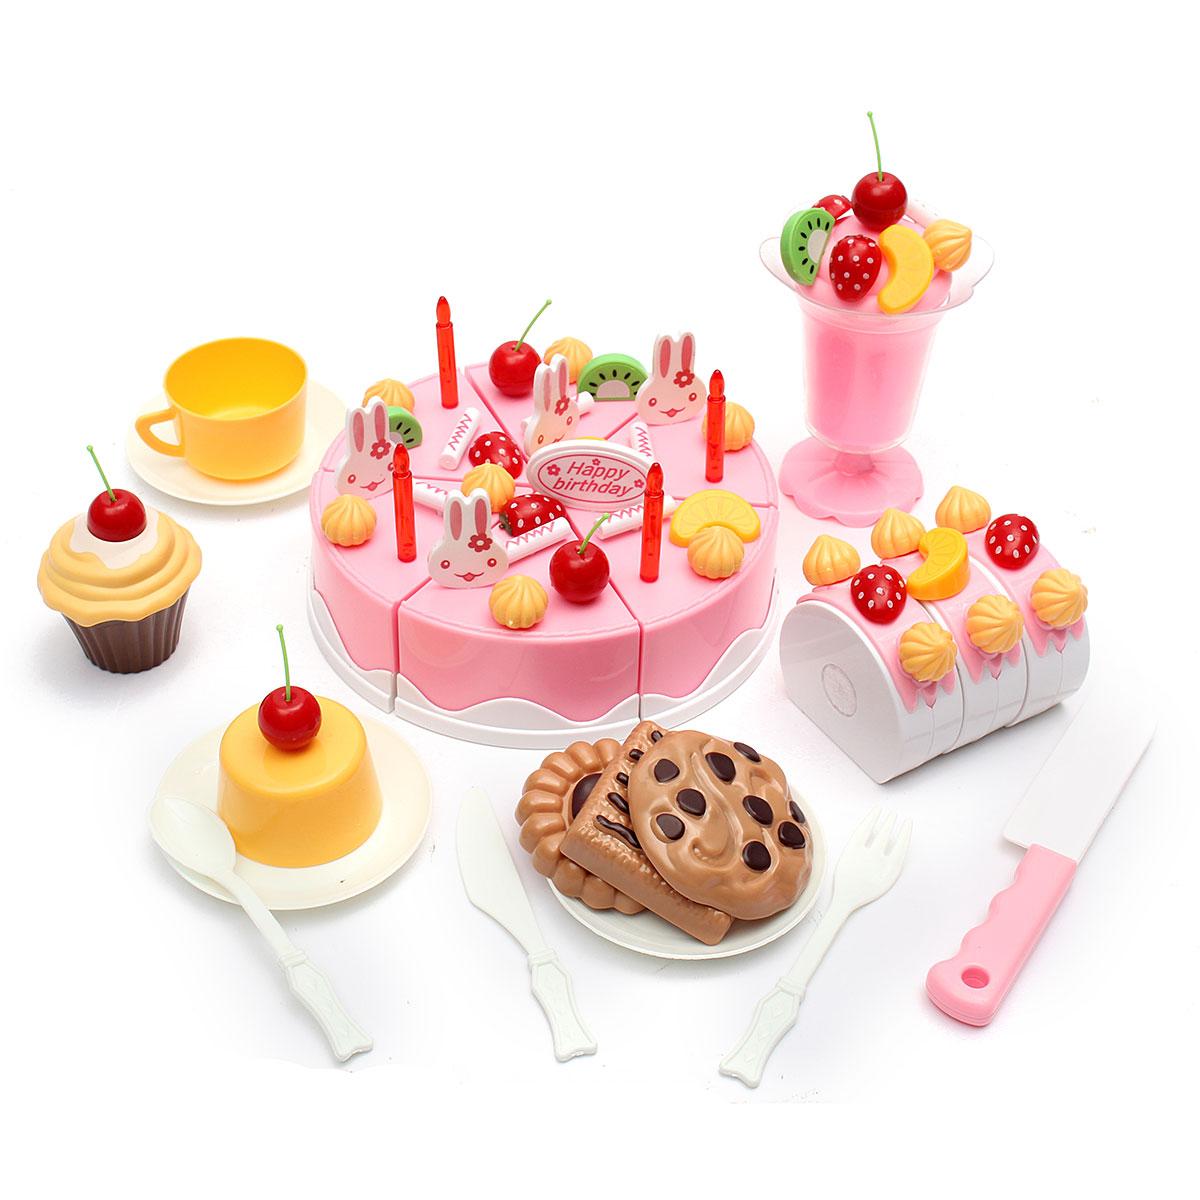 unids una rosa del sistema de cocina juegos de cake set classic